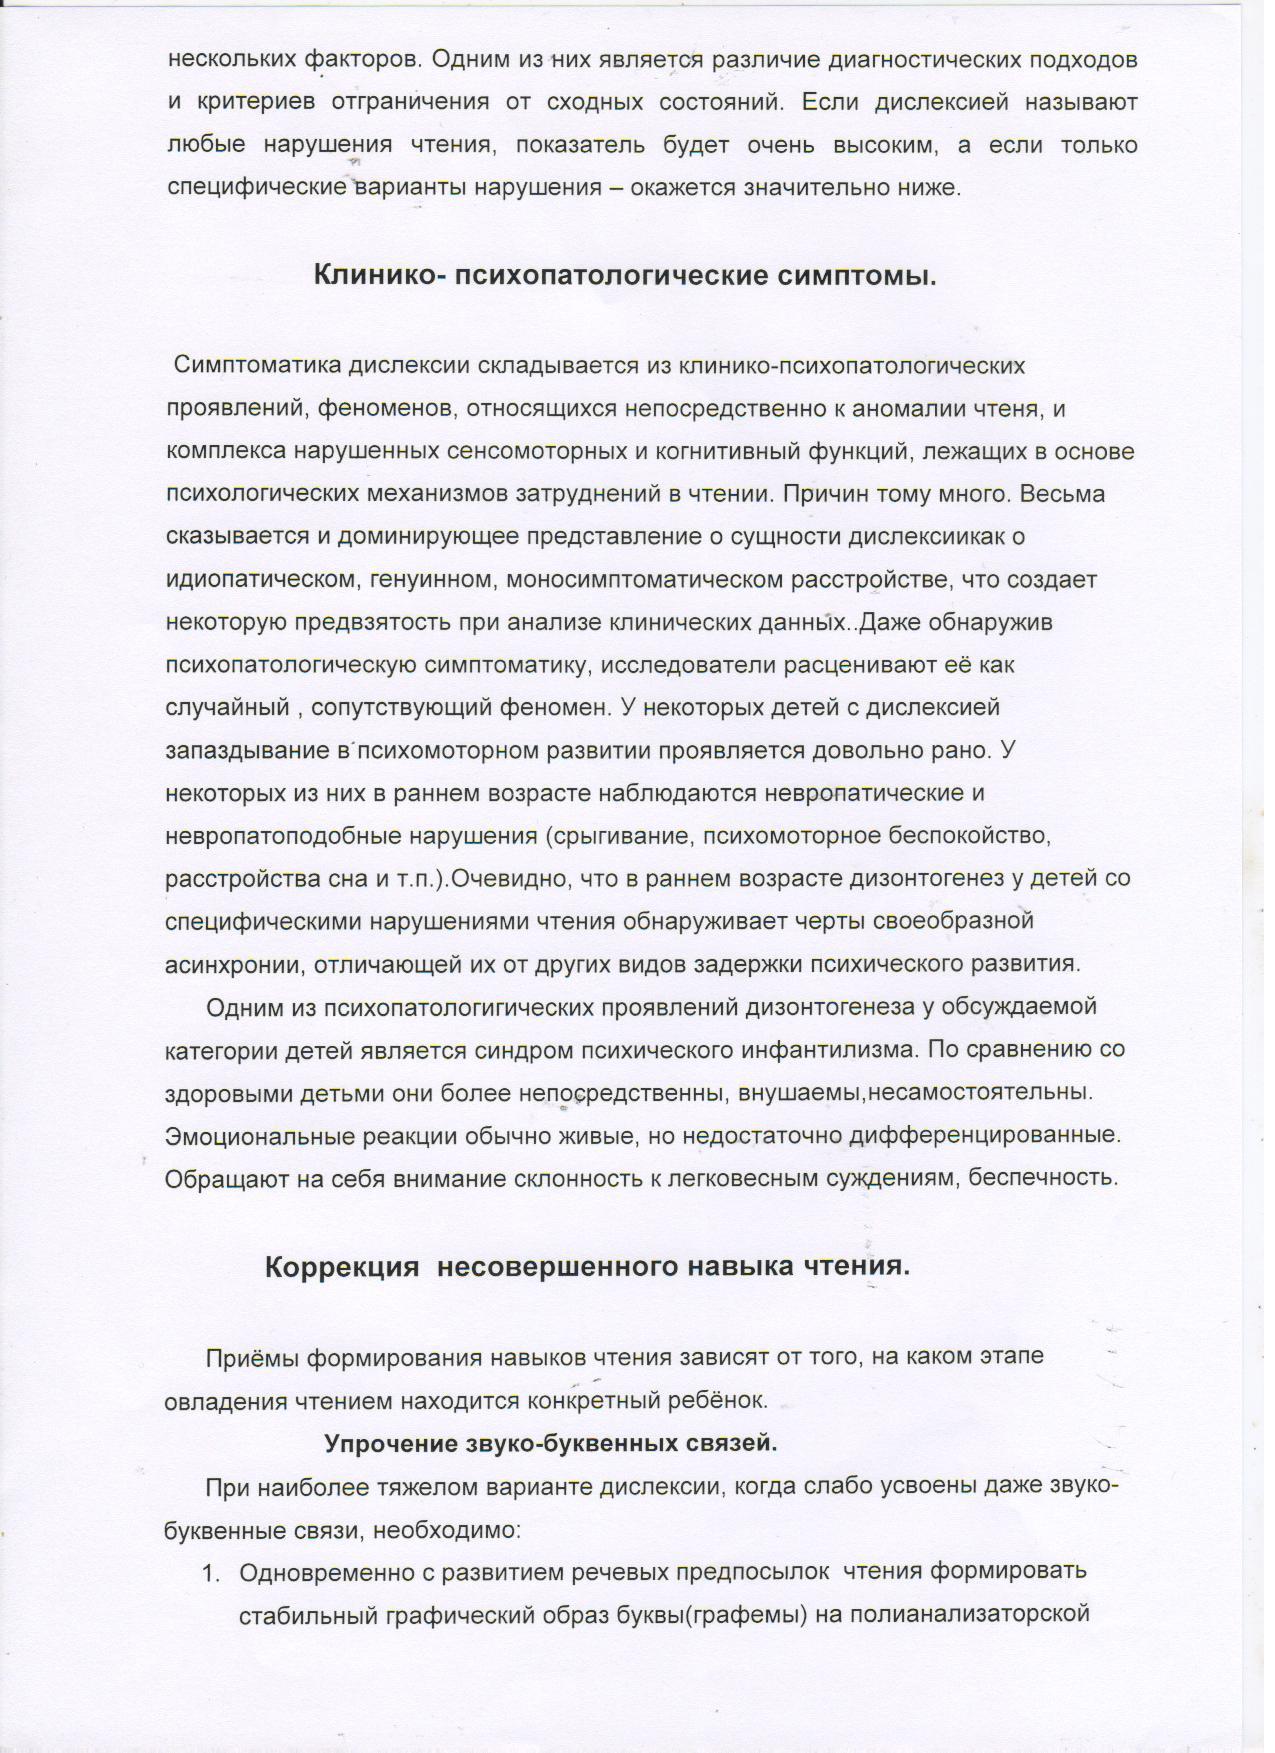 C:\Documents and Settings\Администратор\Рабочий стол\Тептякова Е.А. 006.jpg